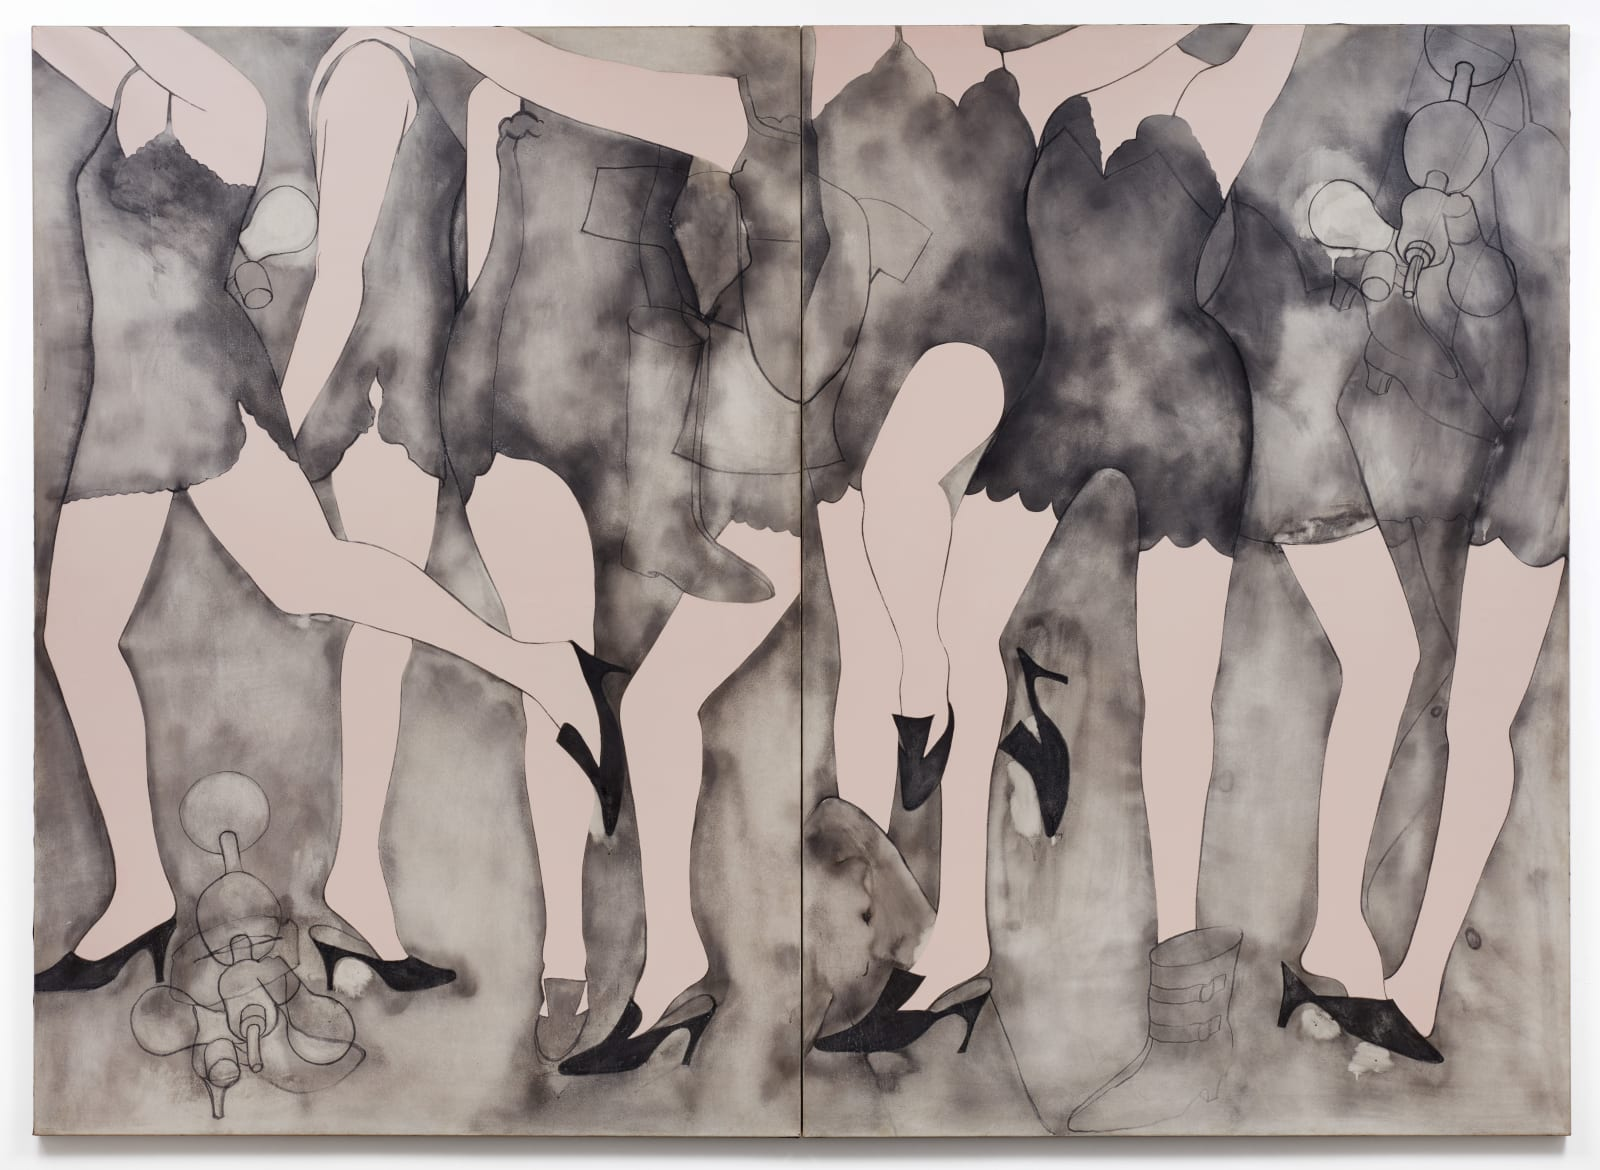 Jim Dine, Moving Girls & Dreams, 1965